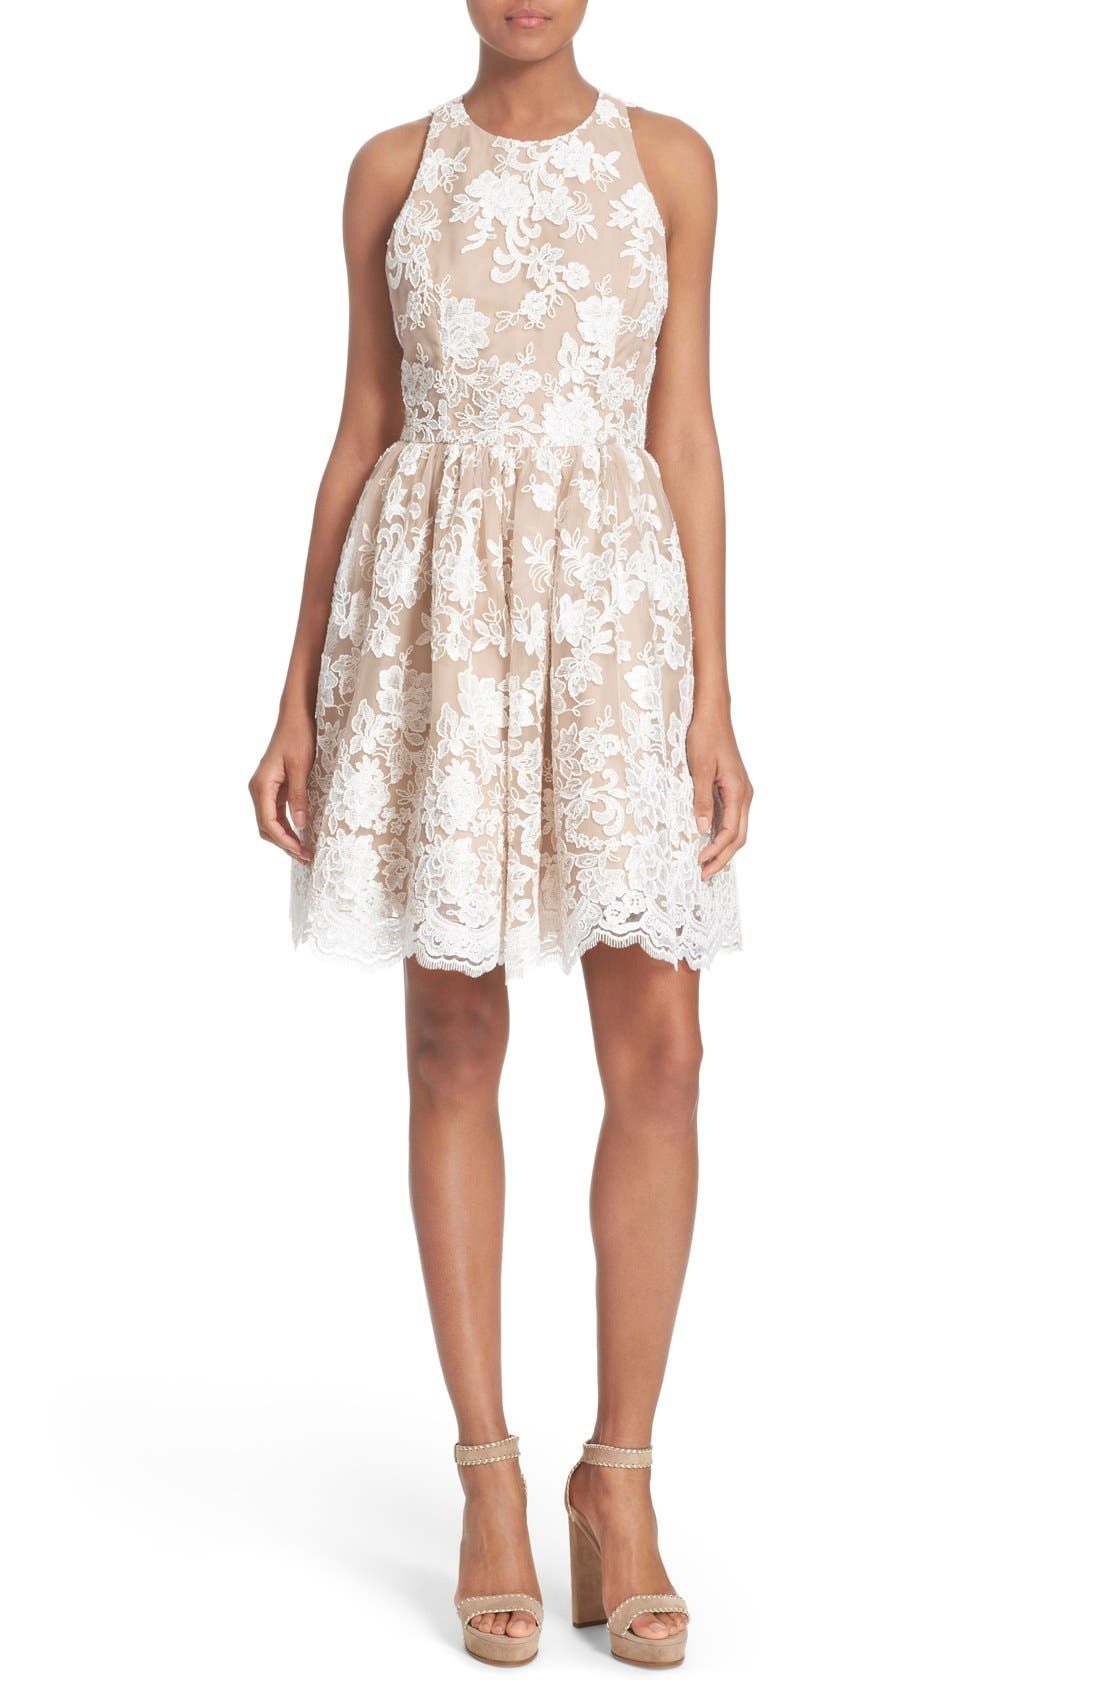 Main Image - Alice + Olivia 'Ladonna' Lace Fit & Flare Dress